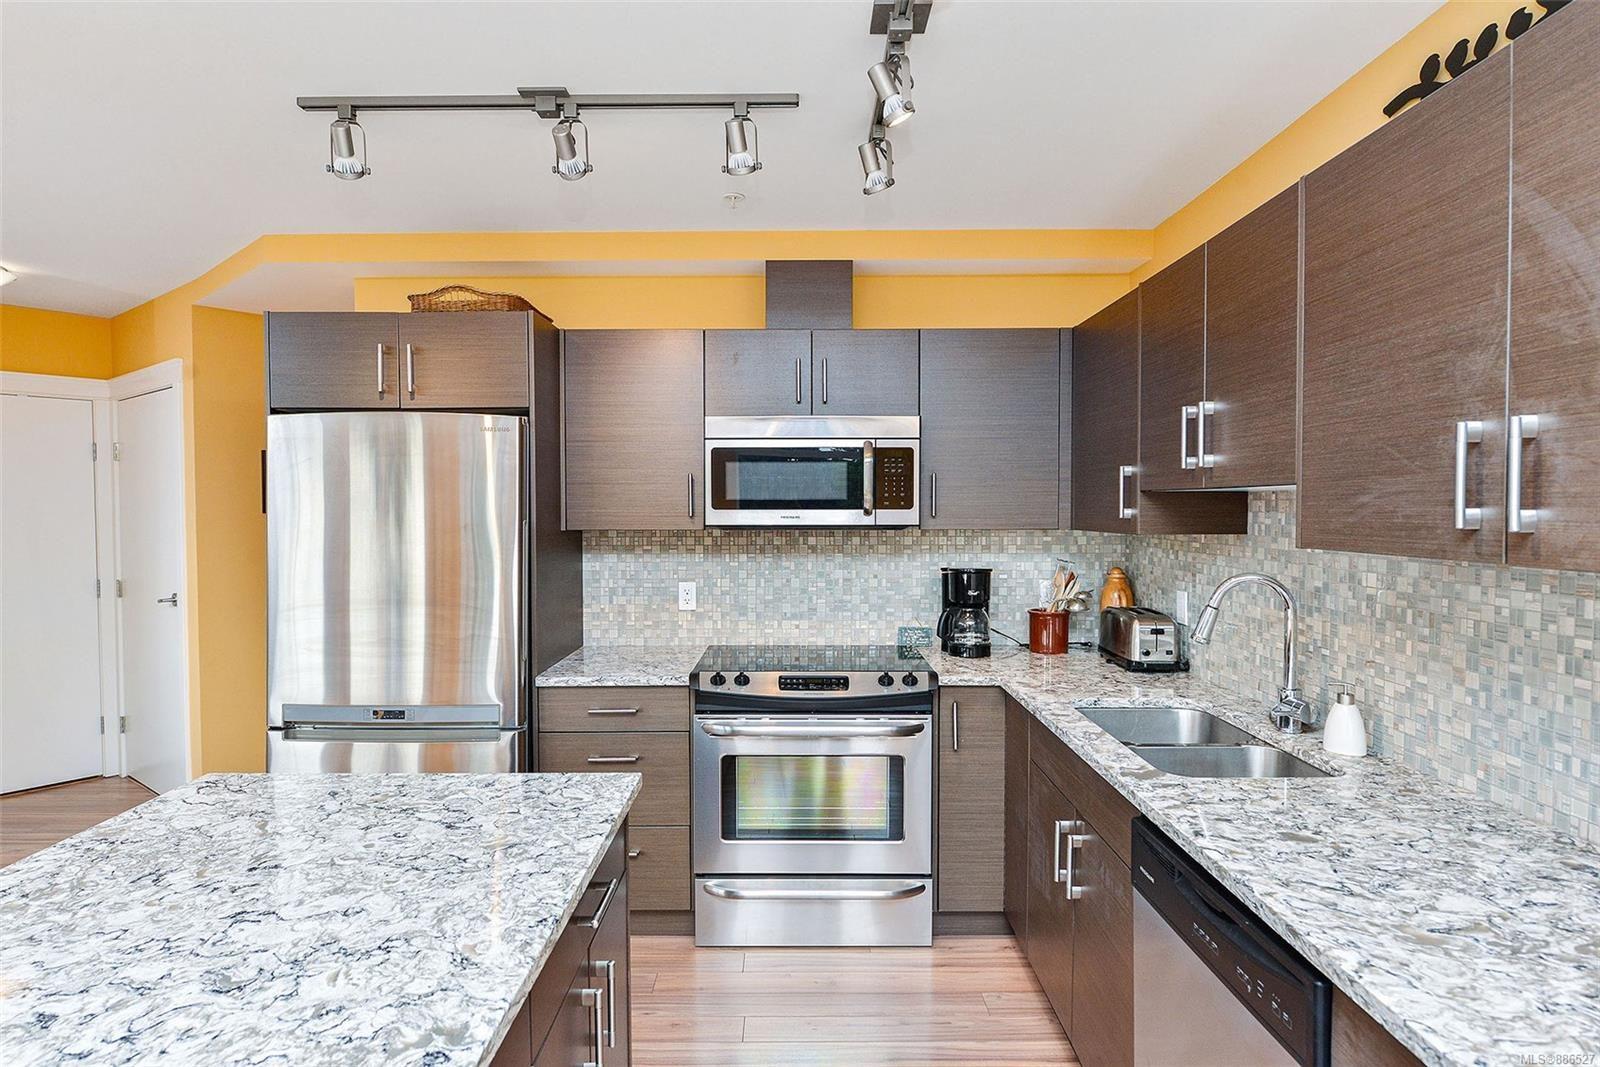 Main Photo: 207 935 Cloverdale Ave in Saanich: SE Quadra Condo for sale (Saanich East)  : MLS®# 886527